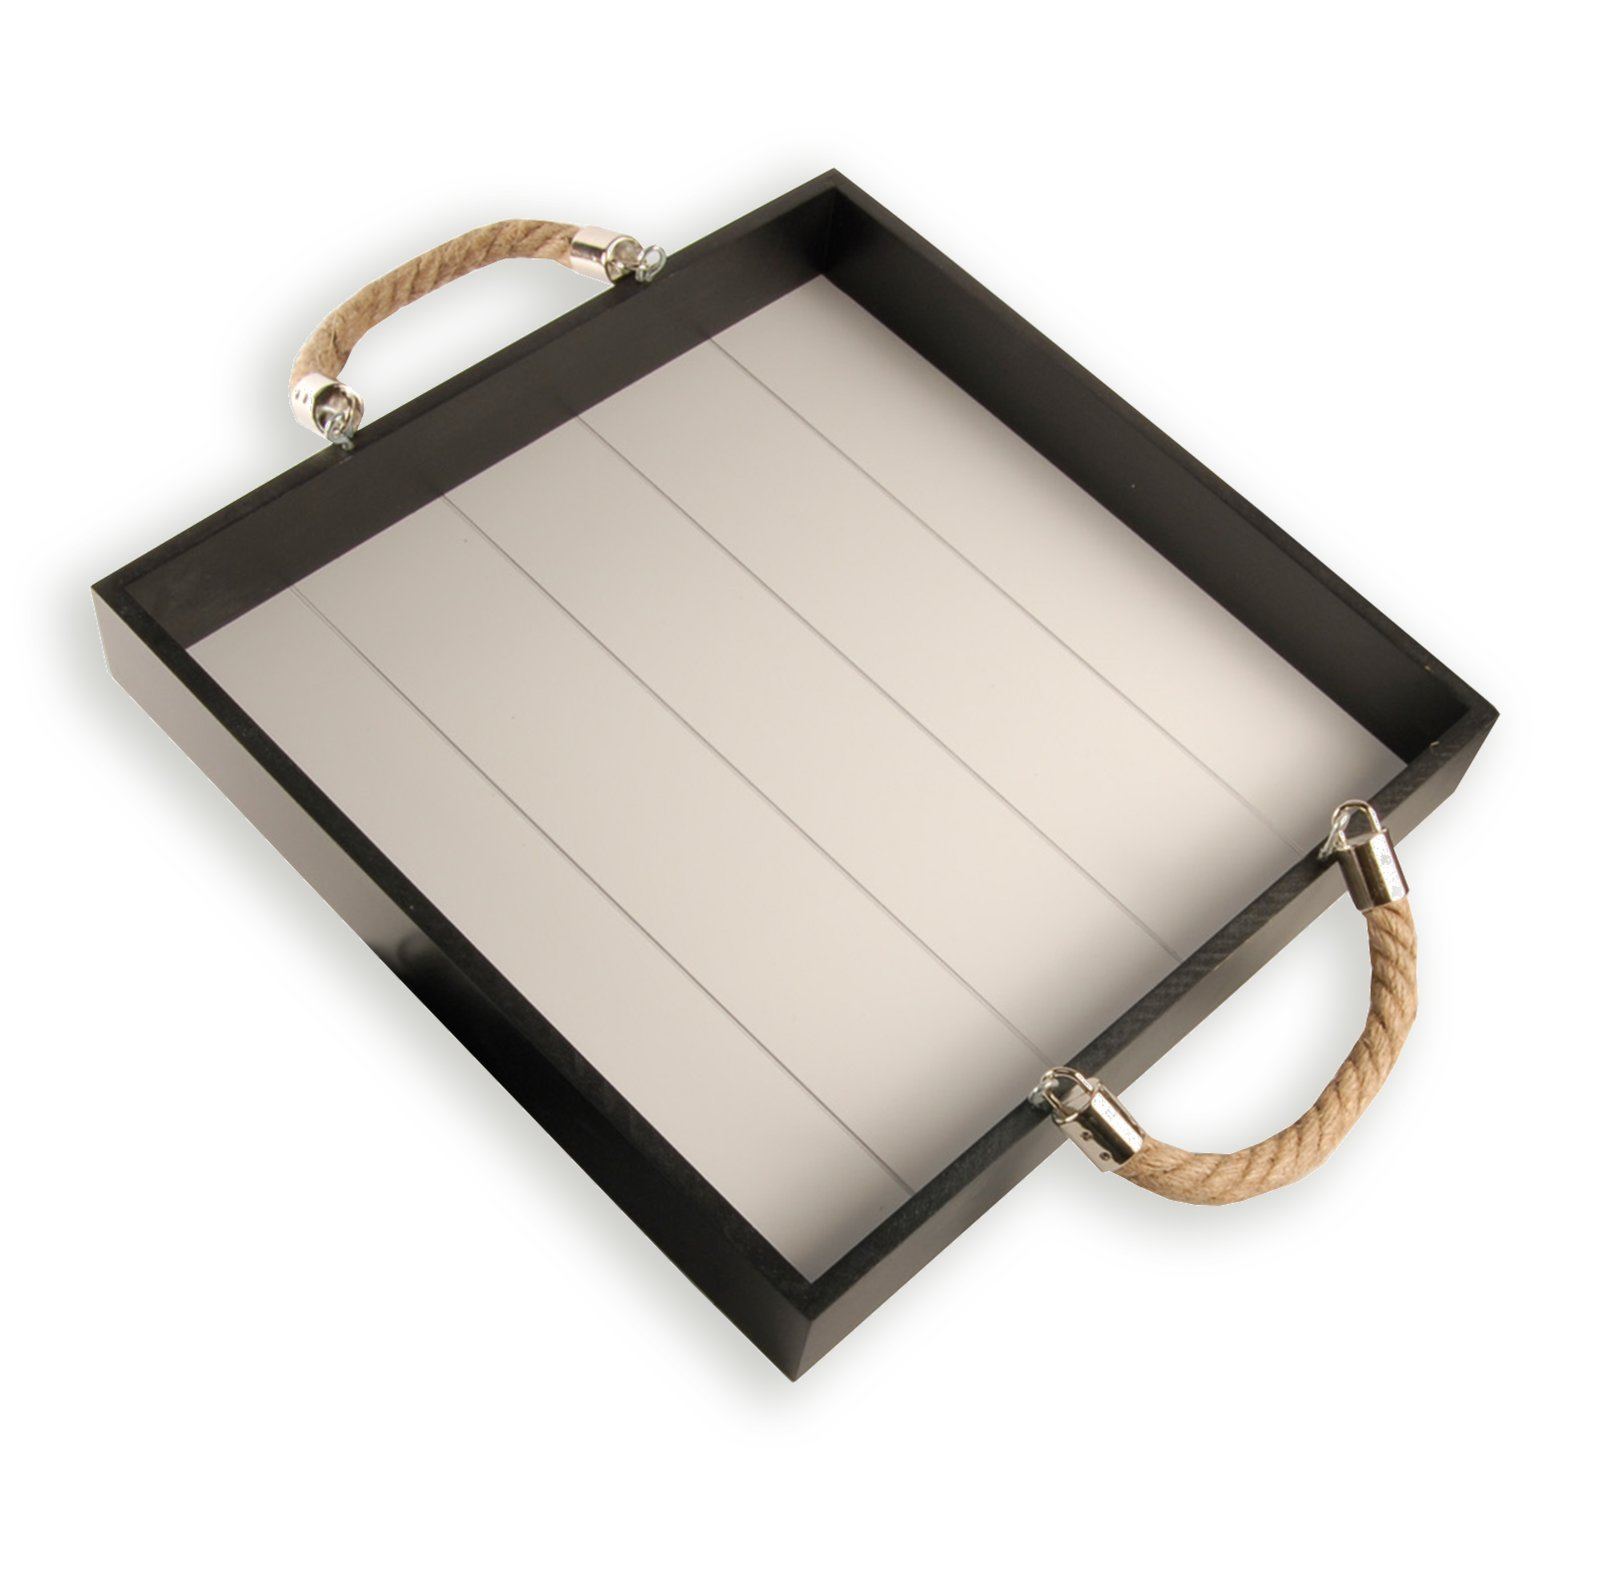 tablett wei schwarz seilgriffe 30x30 cm dekofiguren objekte deko artikel deko. Black Bedroom Furniture Sets. Home Design Ideas